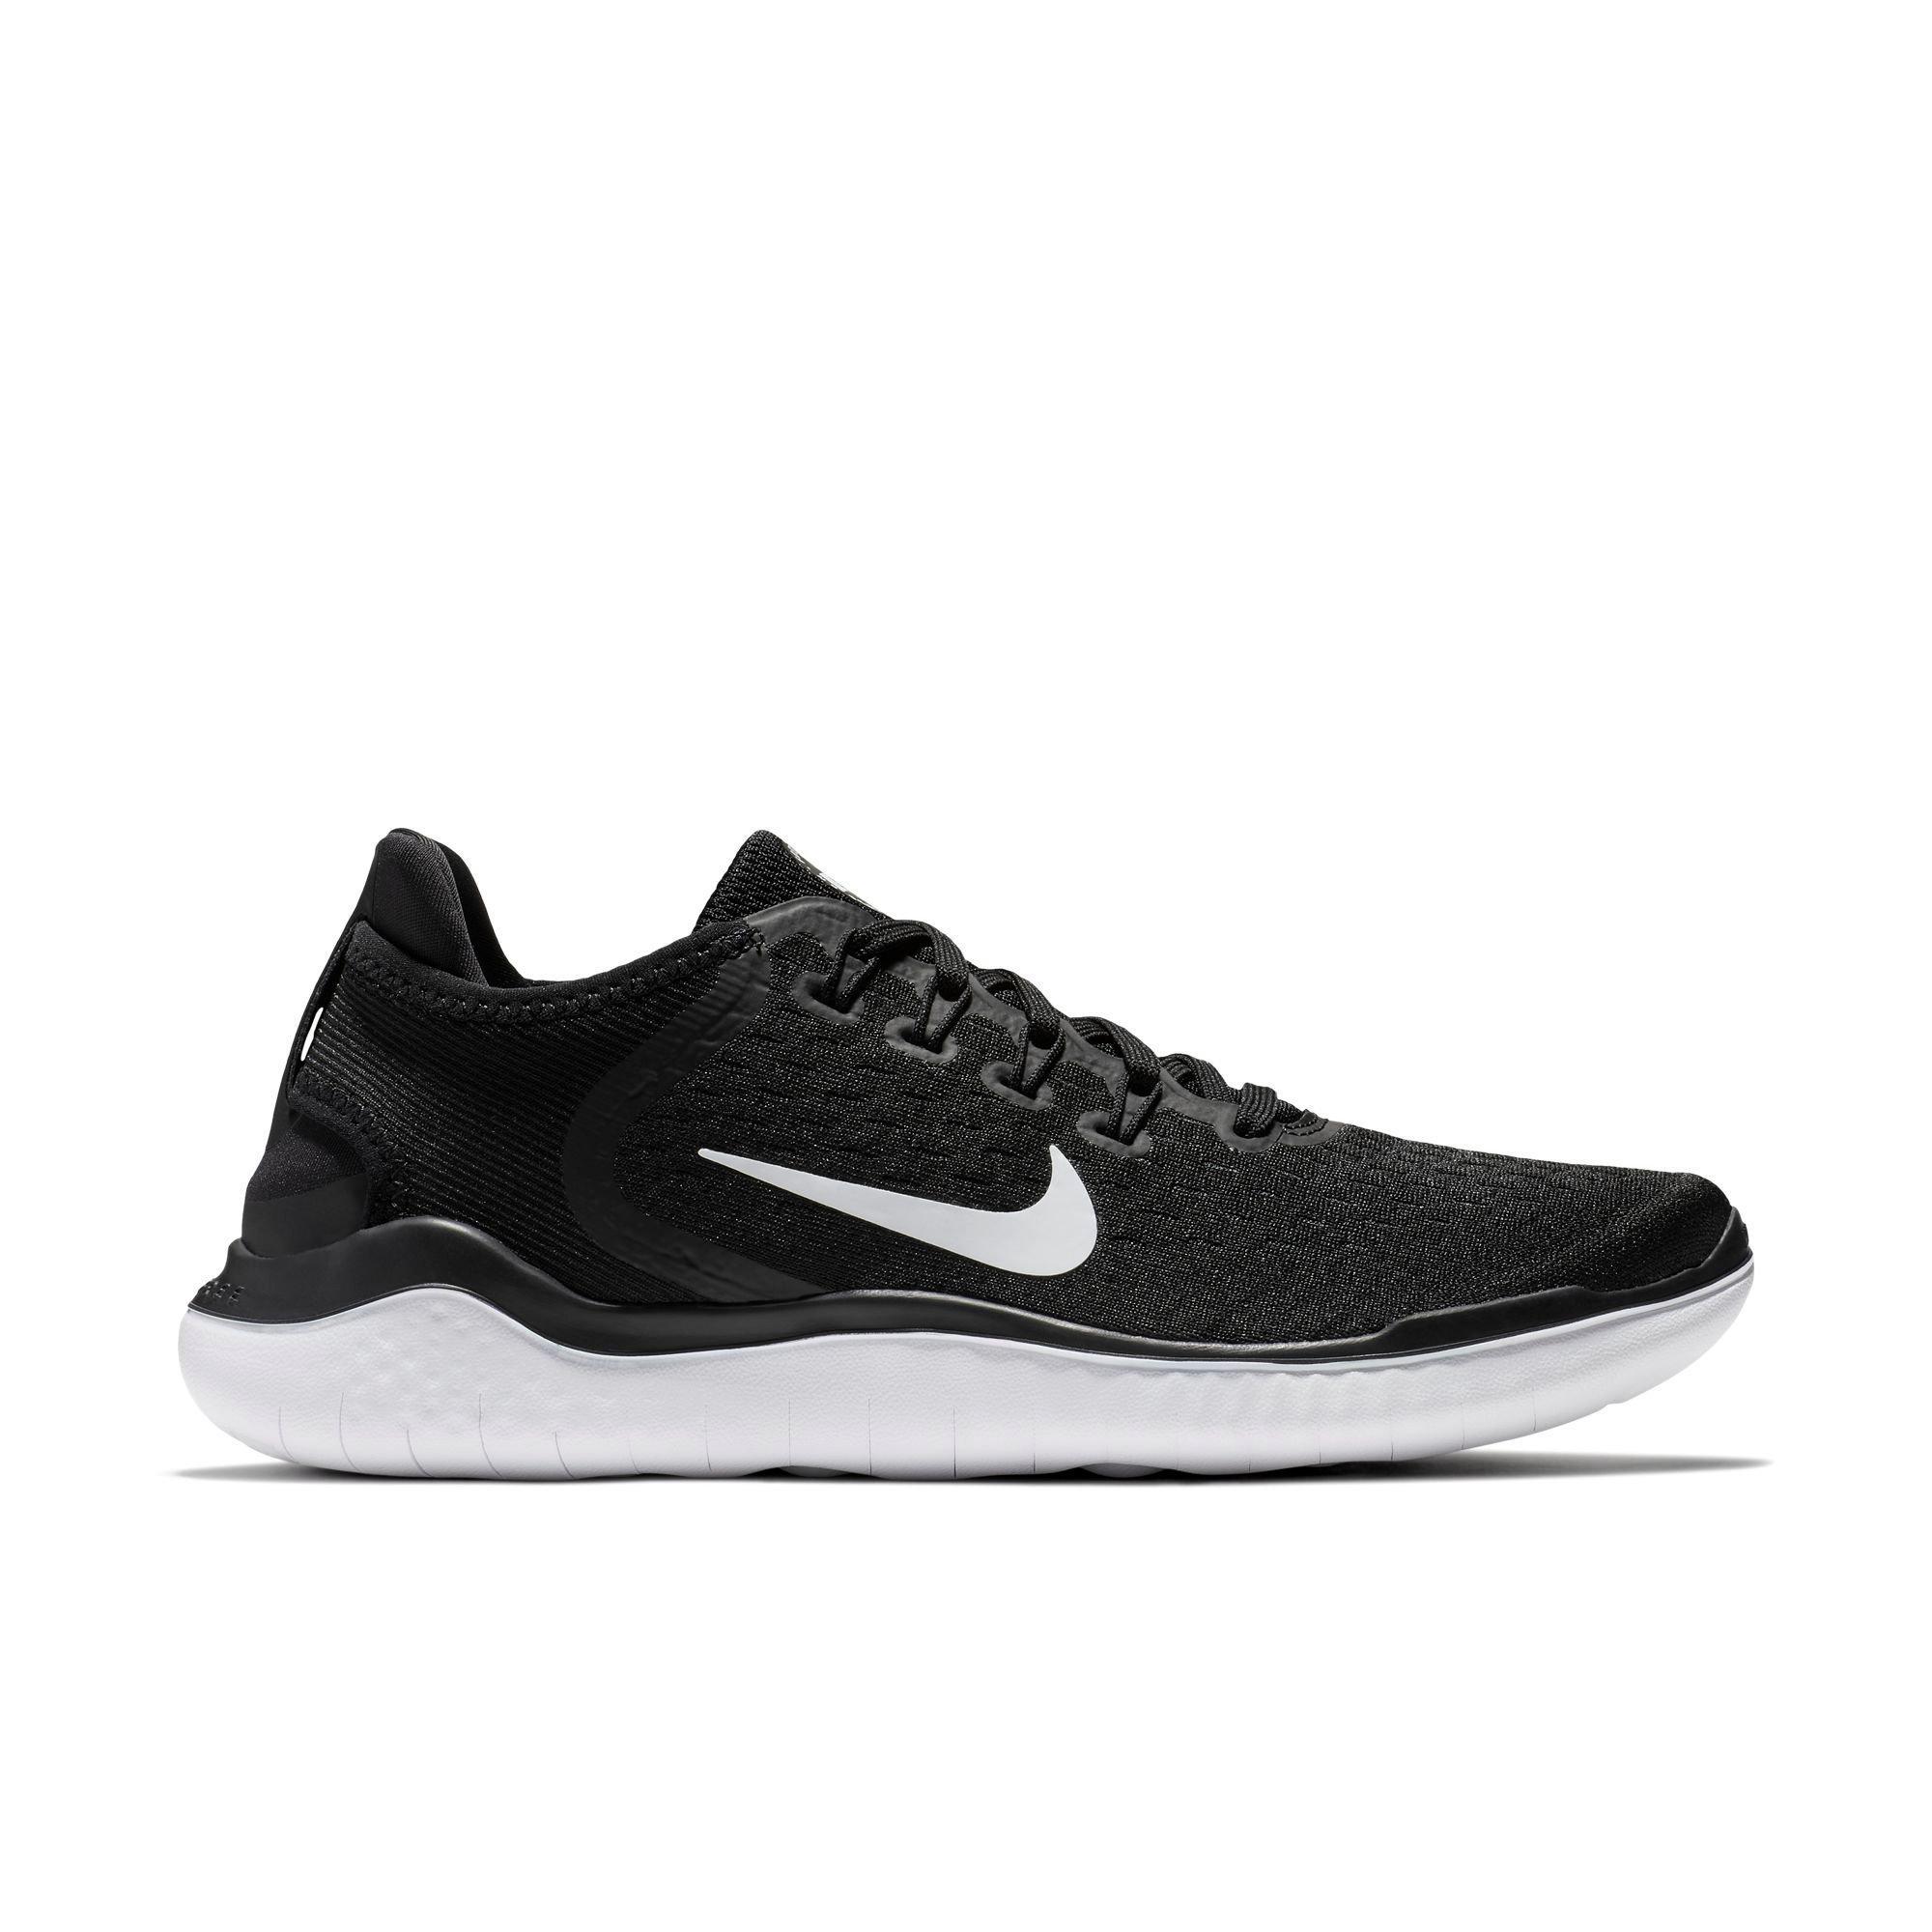 nike womens shoes free walk sneakers